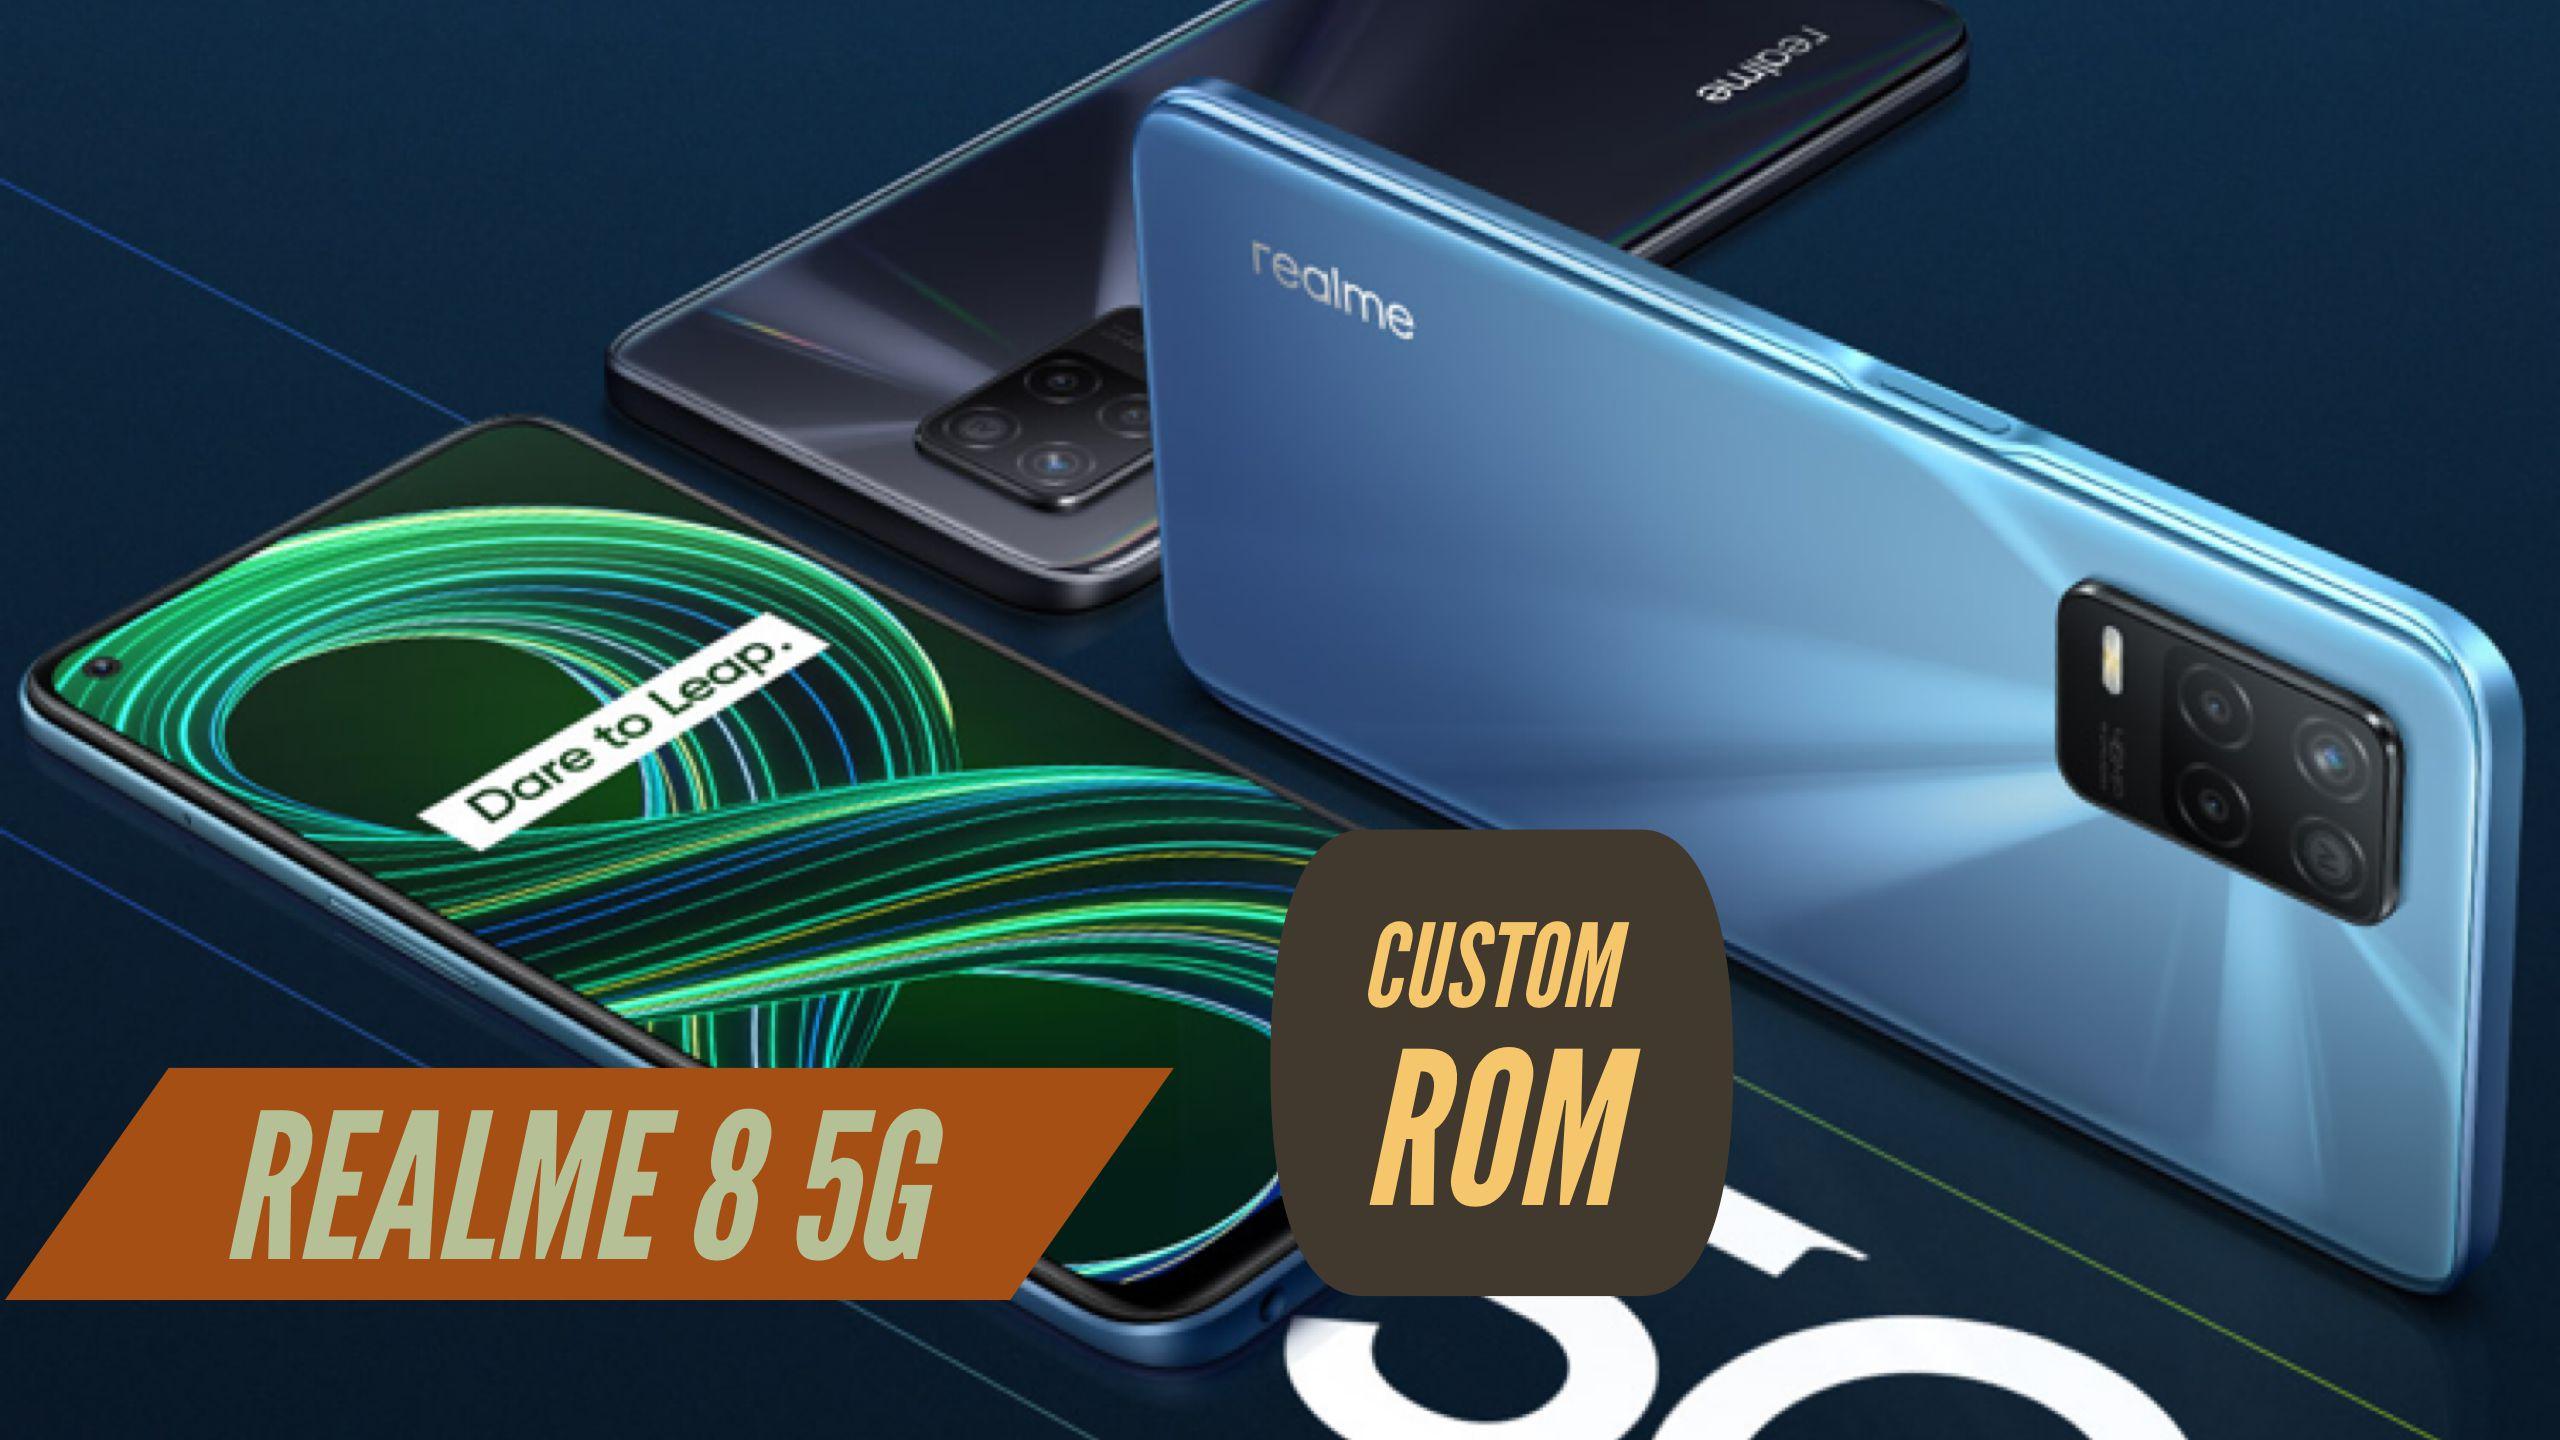 Realme 8 5G Custom ROM